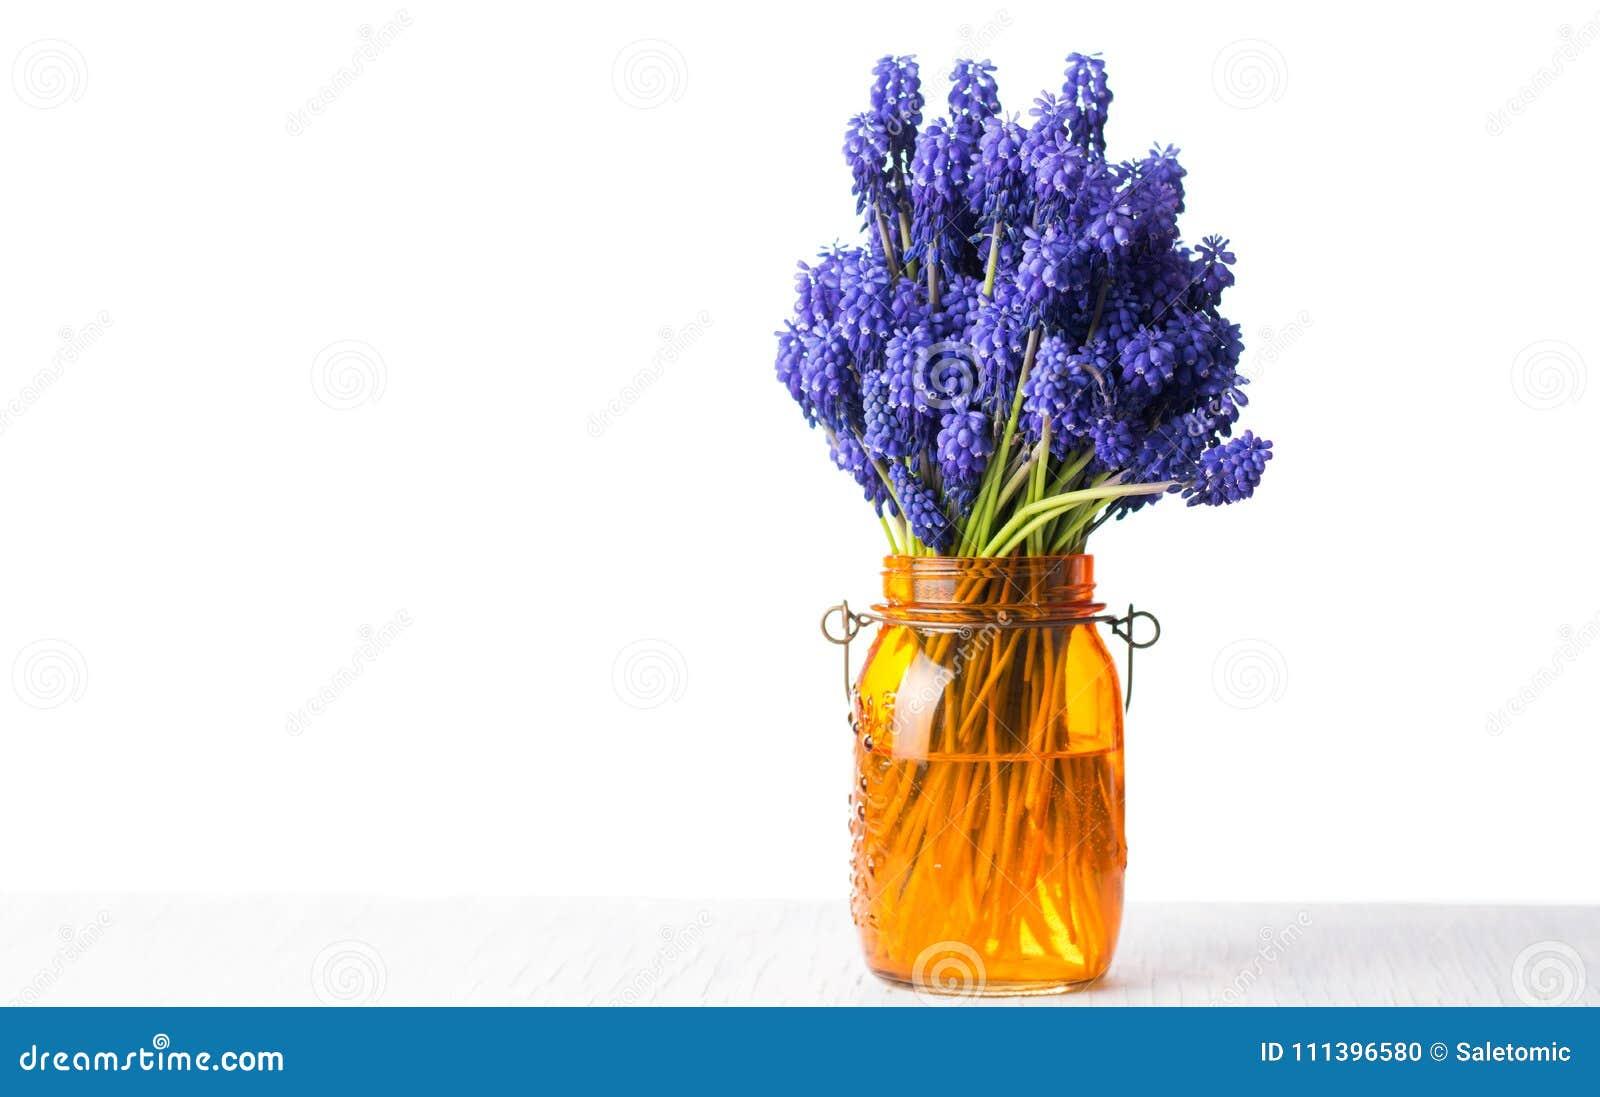 Hyacinth flower bouquet in a vase